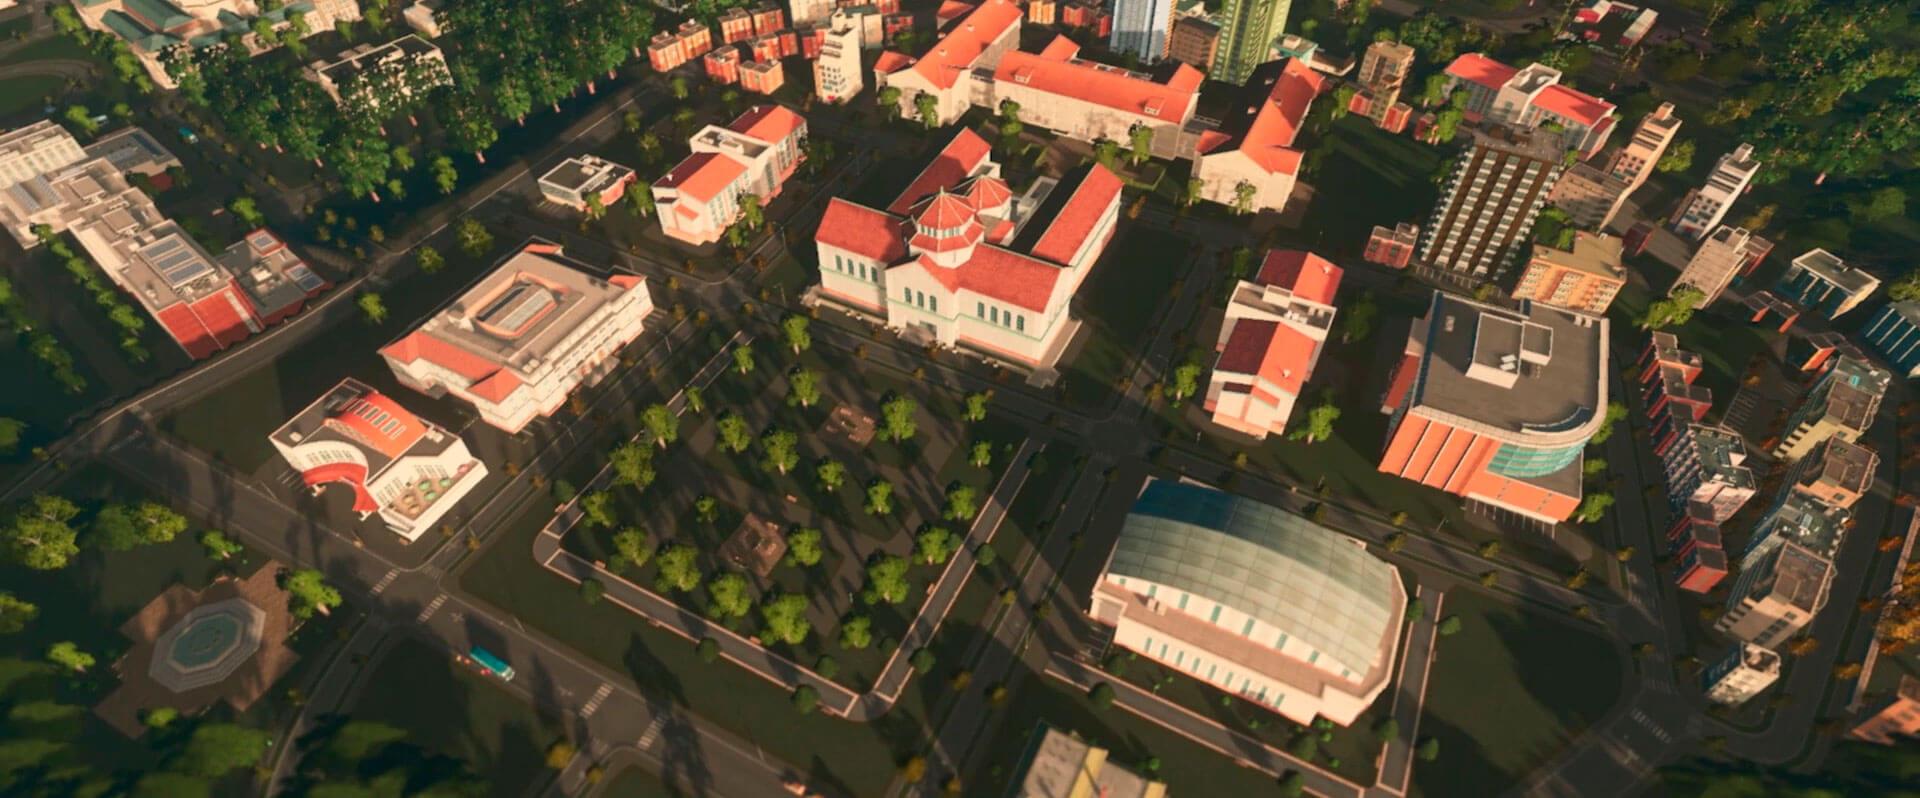 Cities Skylines Campus Análisis Texto 4